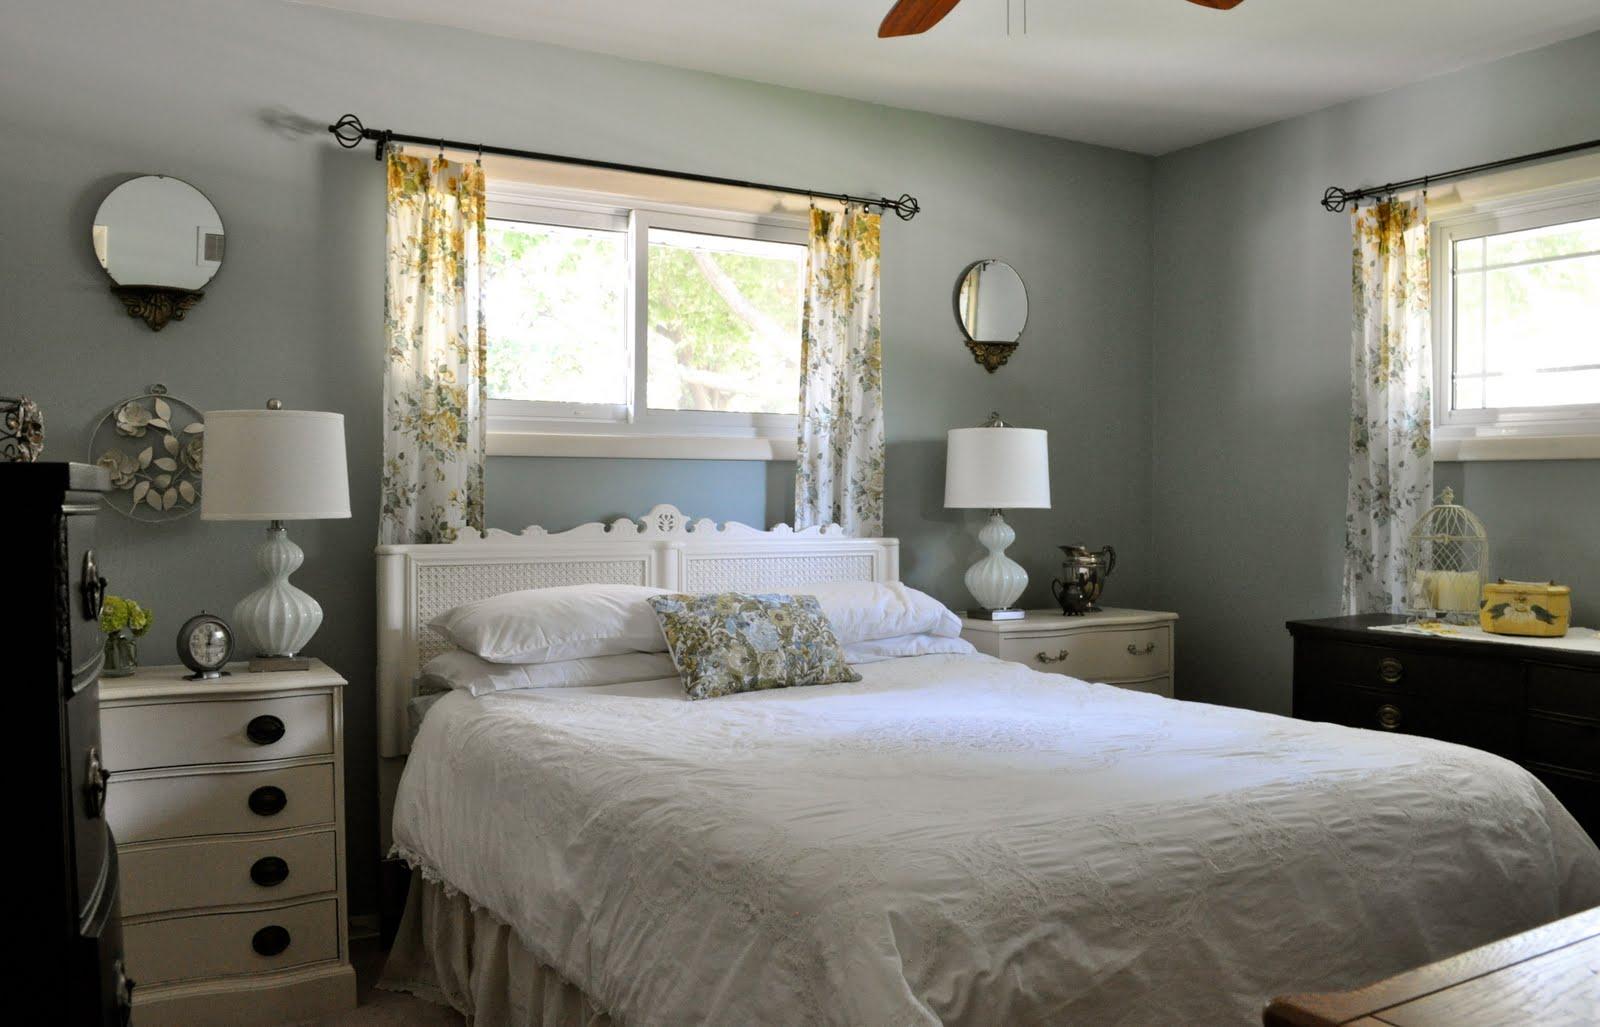 An Oldie But Goodie Bedroom Makeover.....